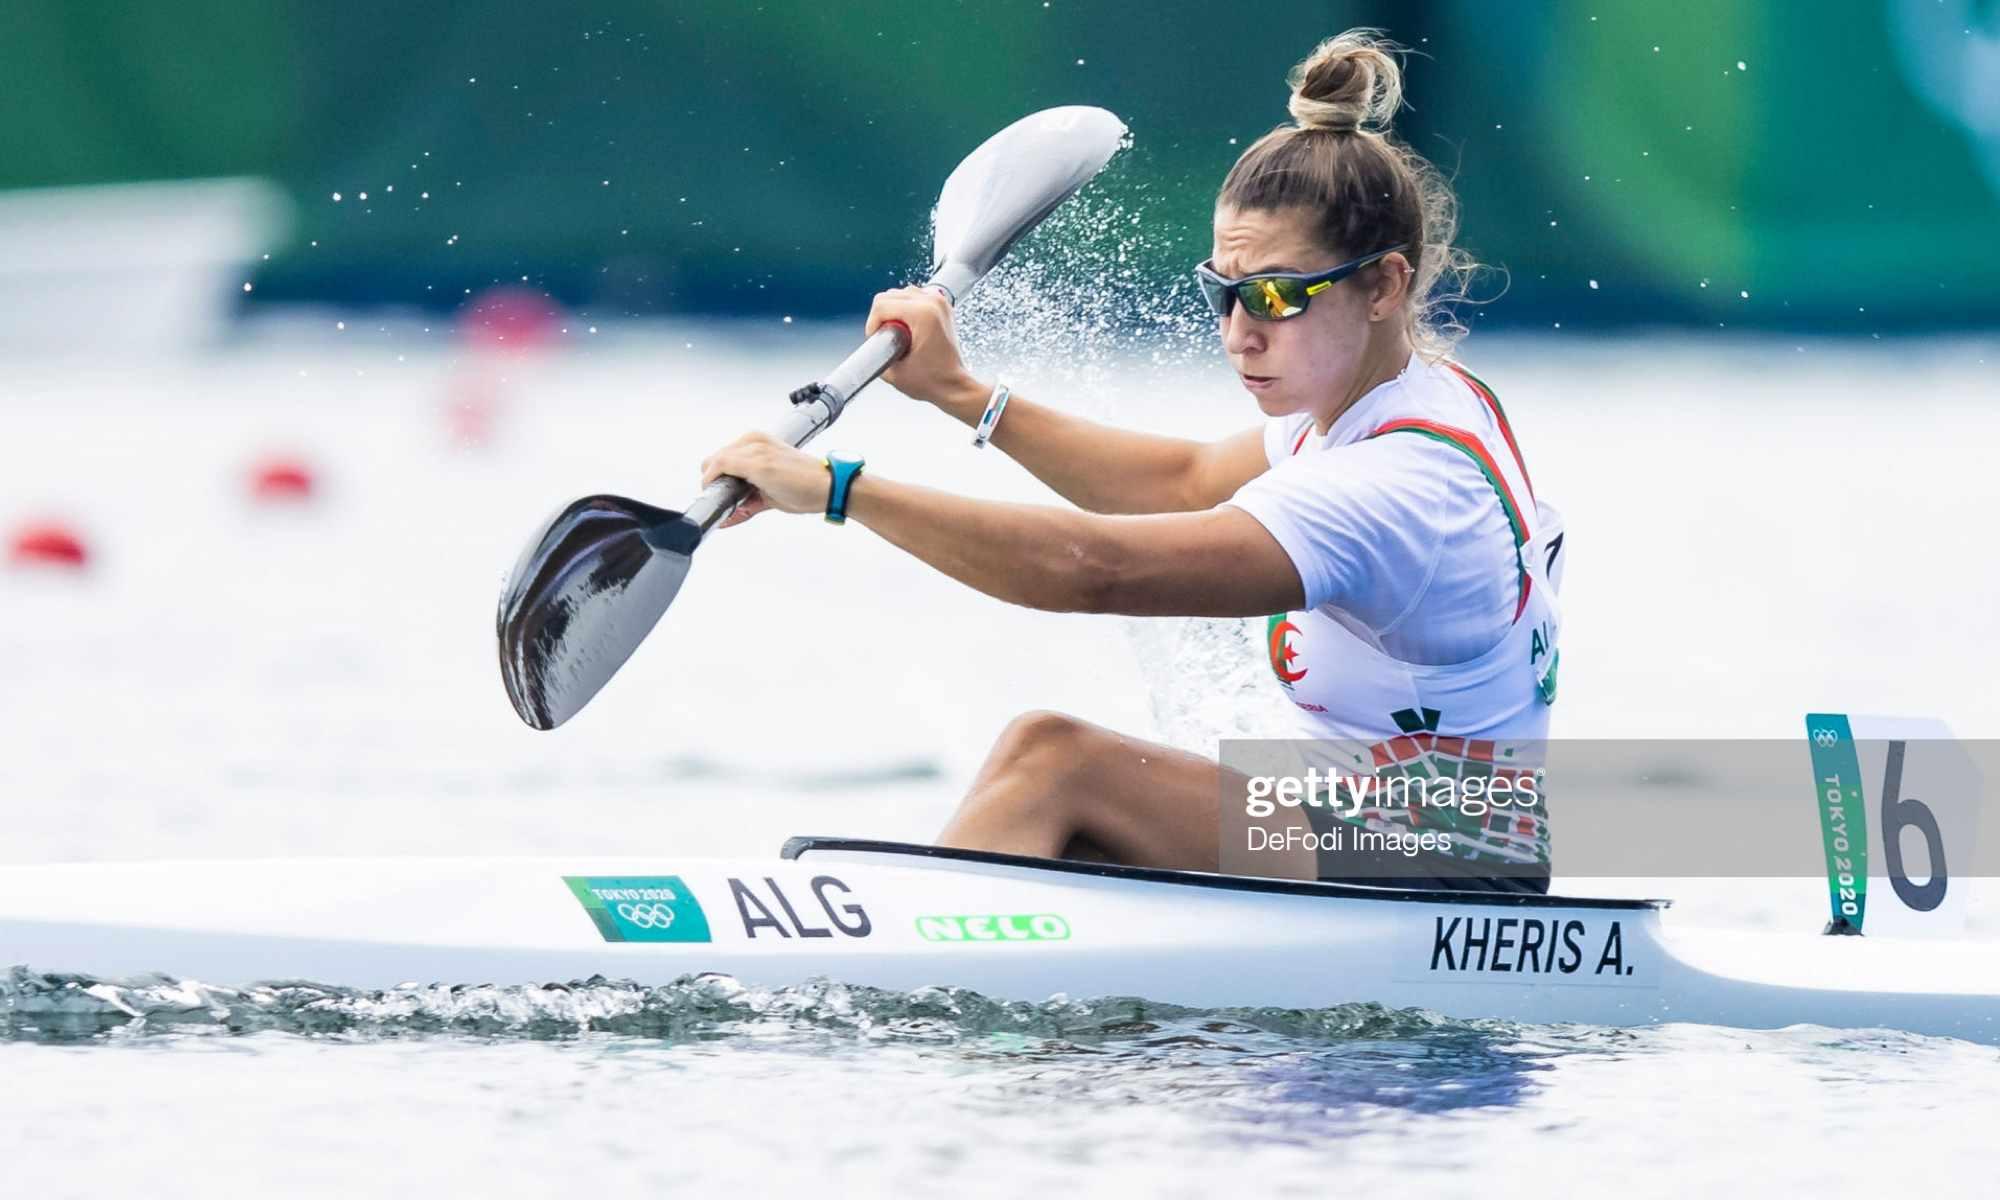 amira kheris canoe kayak tokyo 2020 derniere